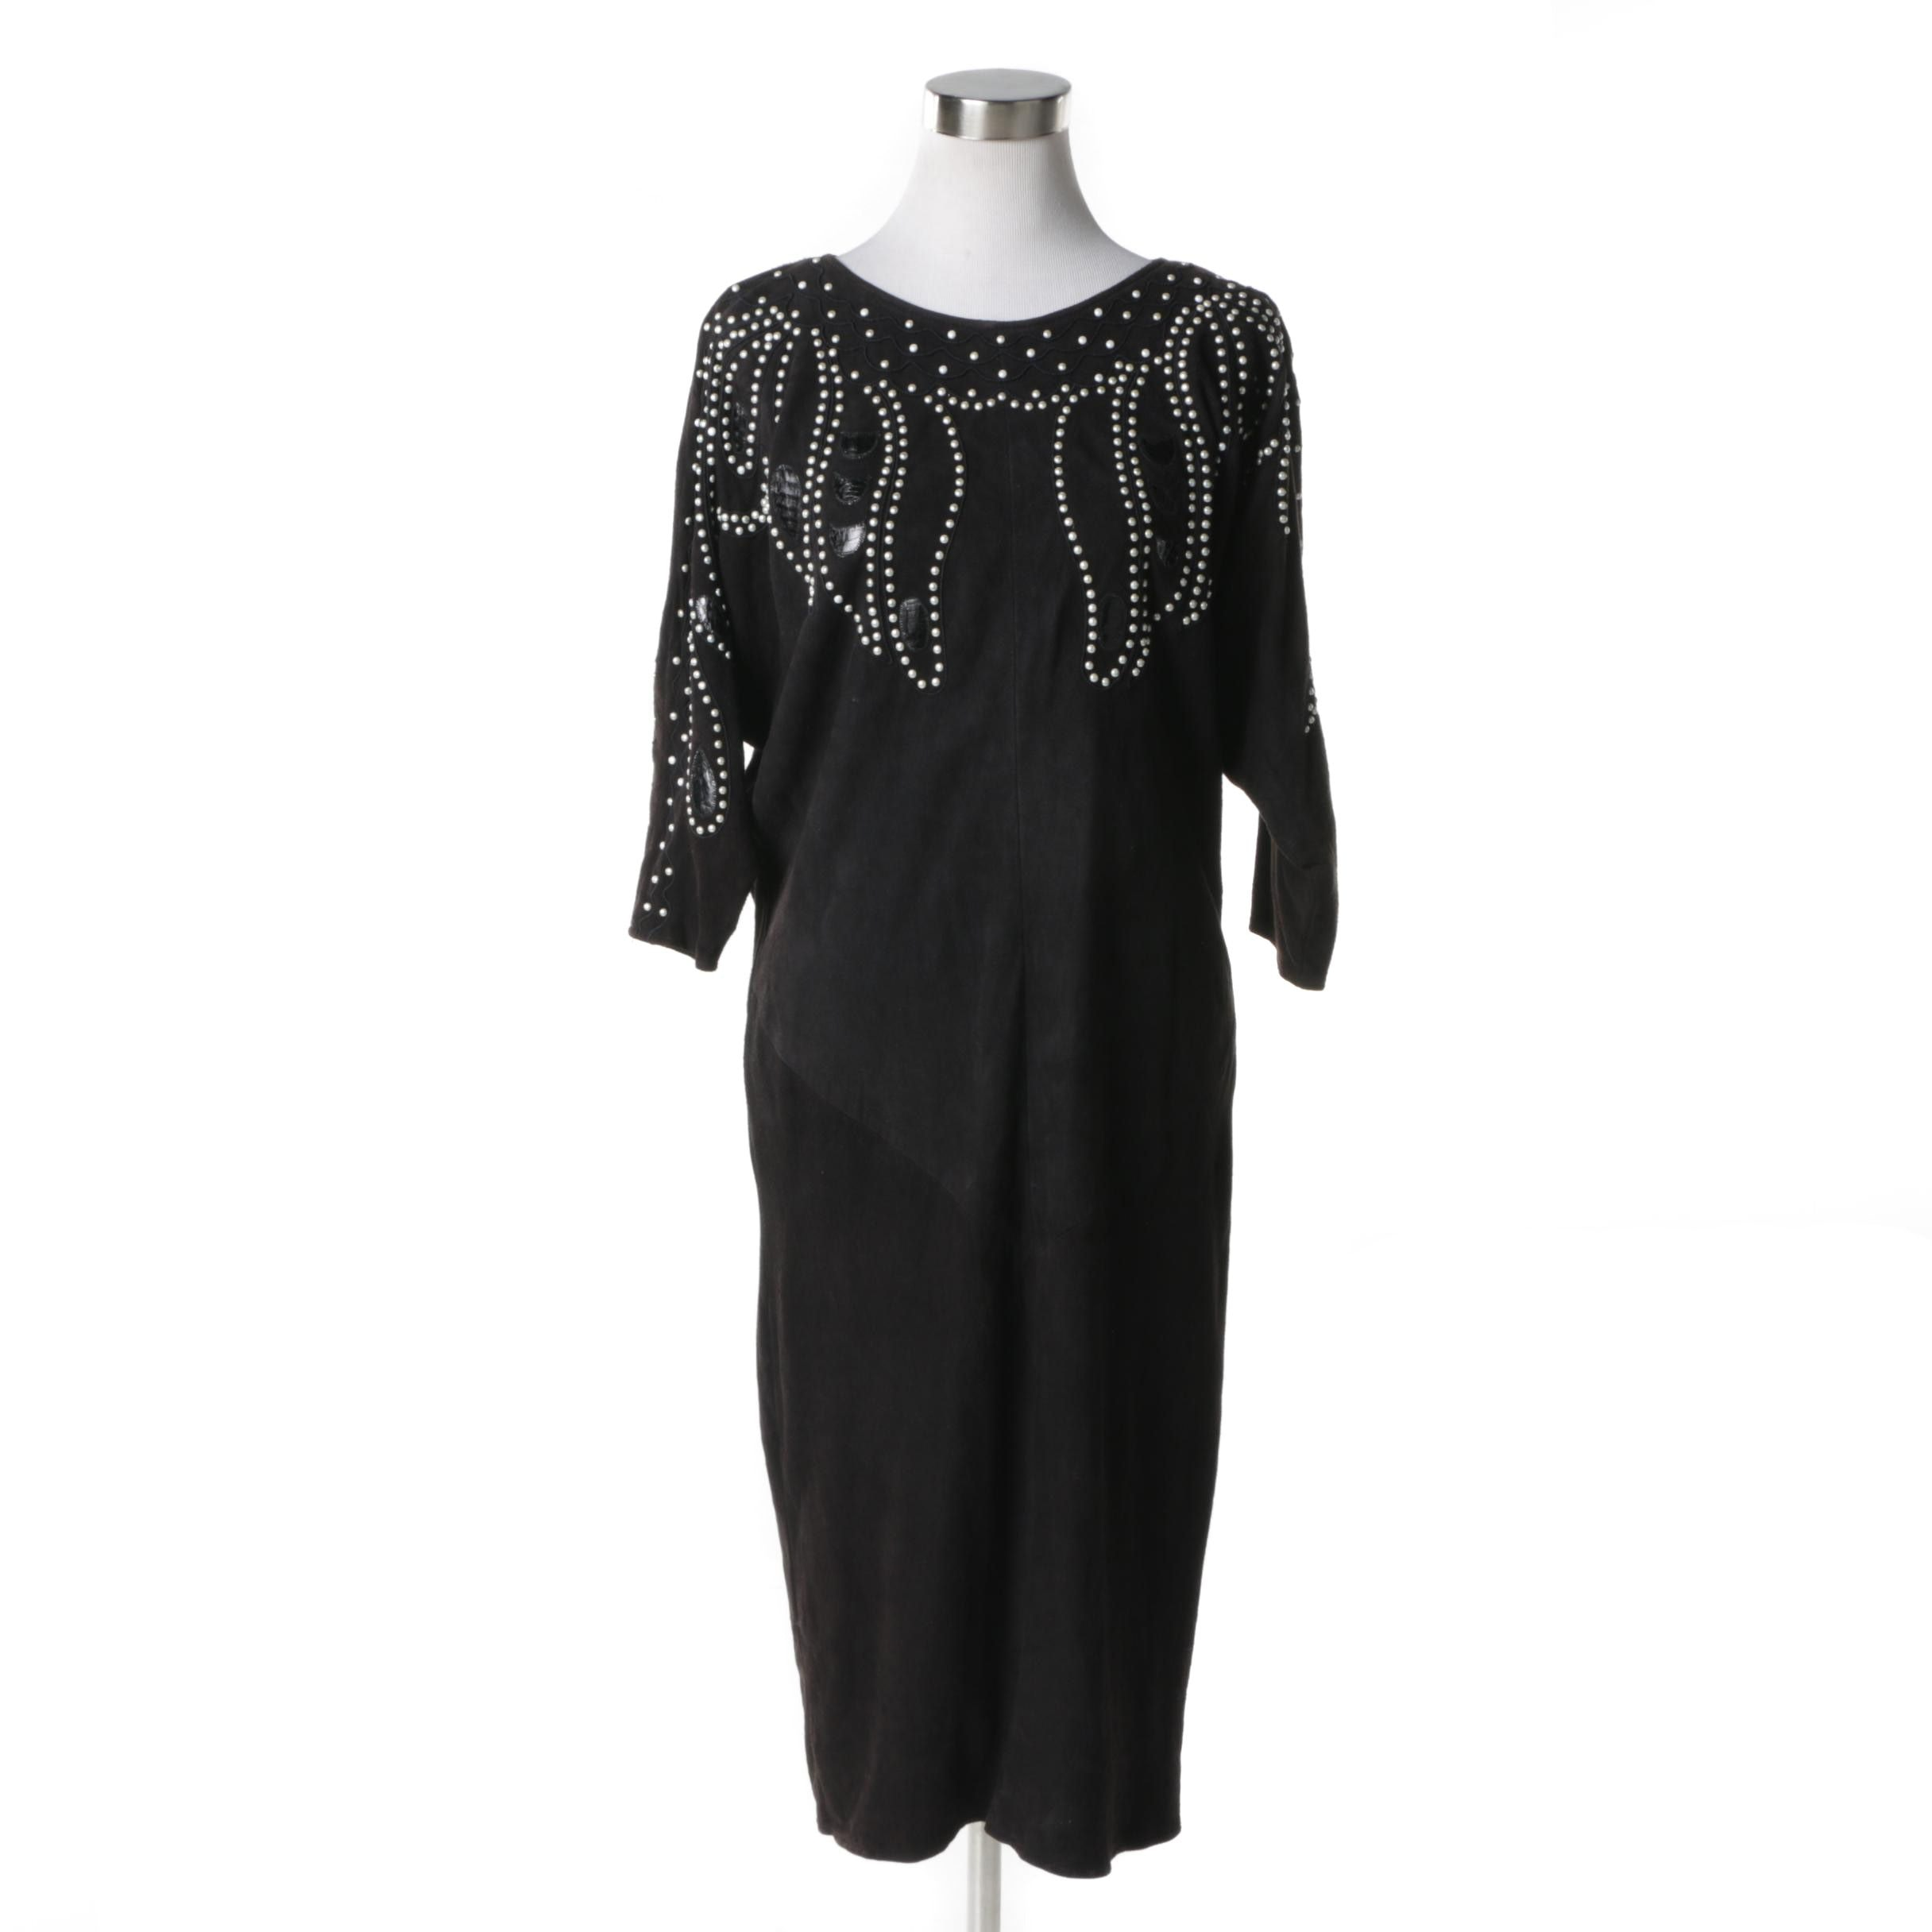 Shalmay Embellished Black Suede and Leather Dress